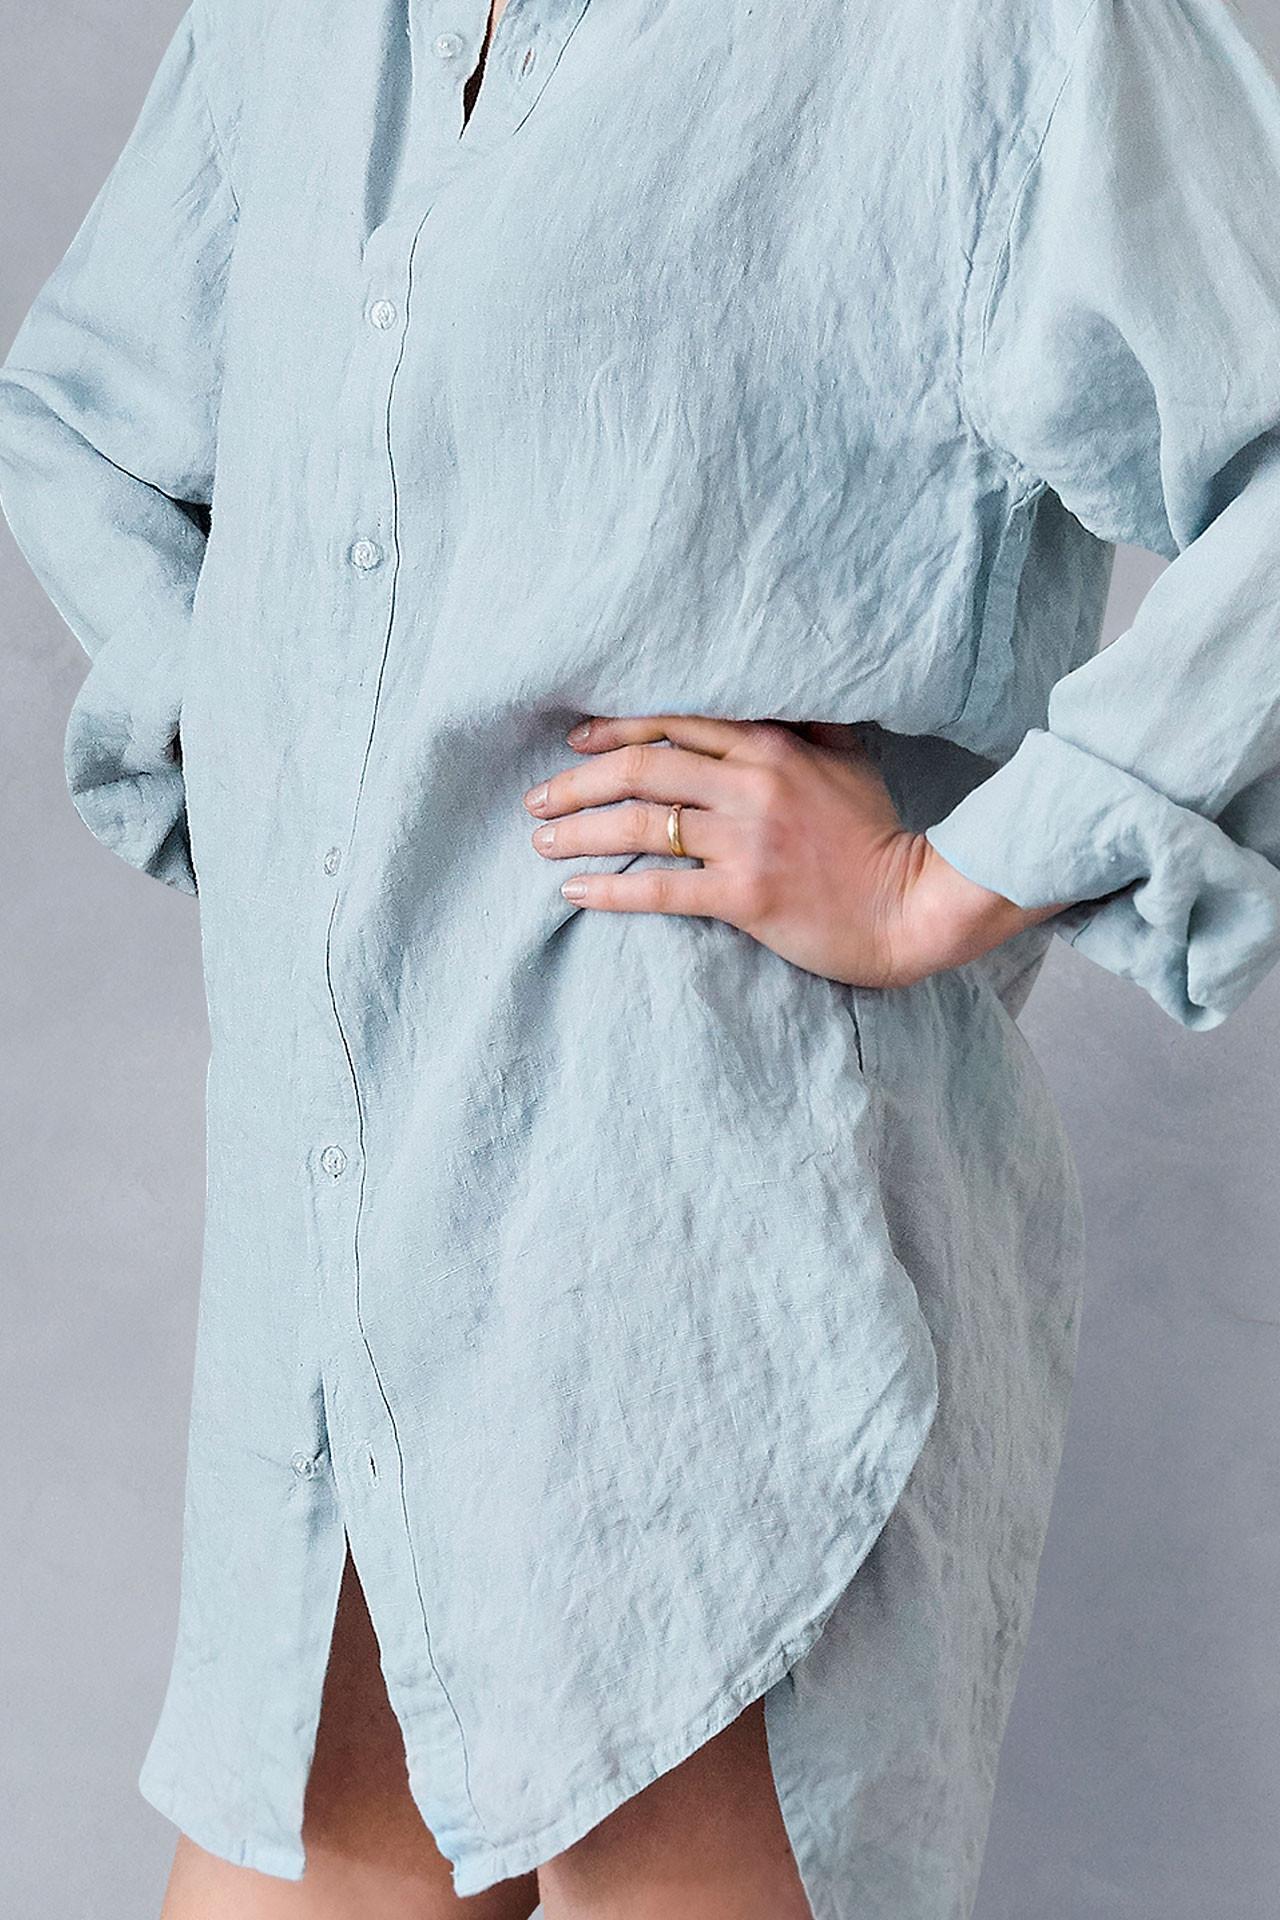 02cb324eab0 ... Hørskjorte til kvinder fra VIIL, dansk design, tekstiler & slow living  ...